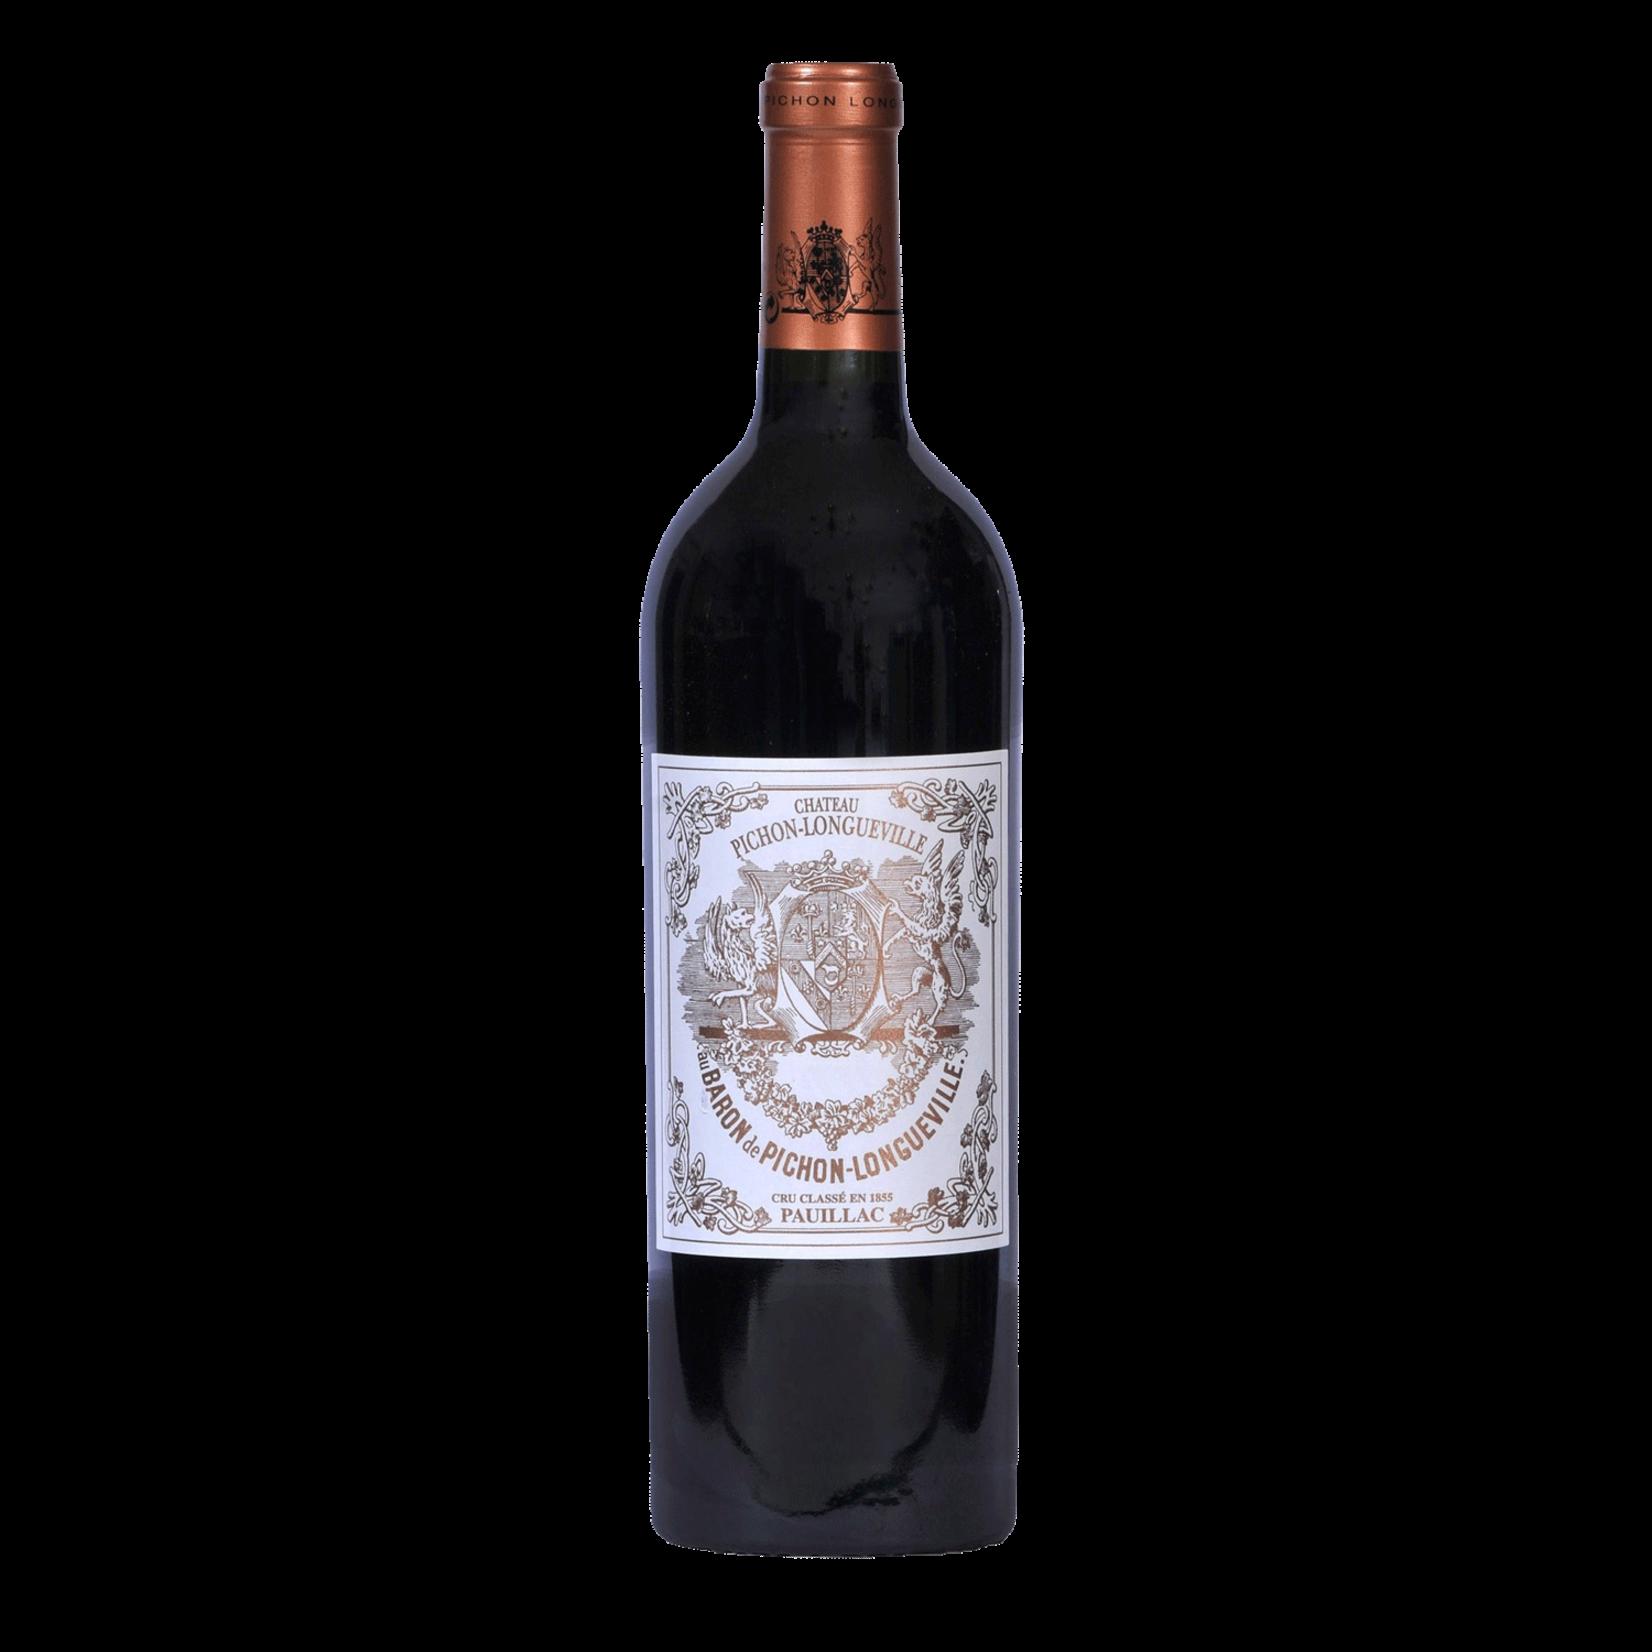 Wine Chateau Pichon Longueville Baron 2002 15L